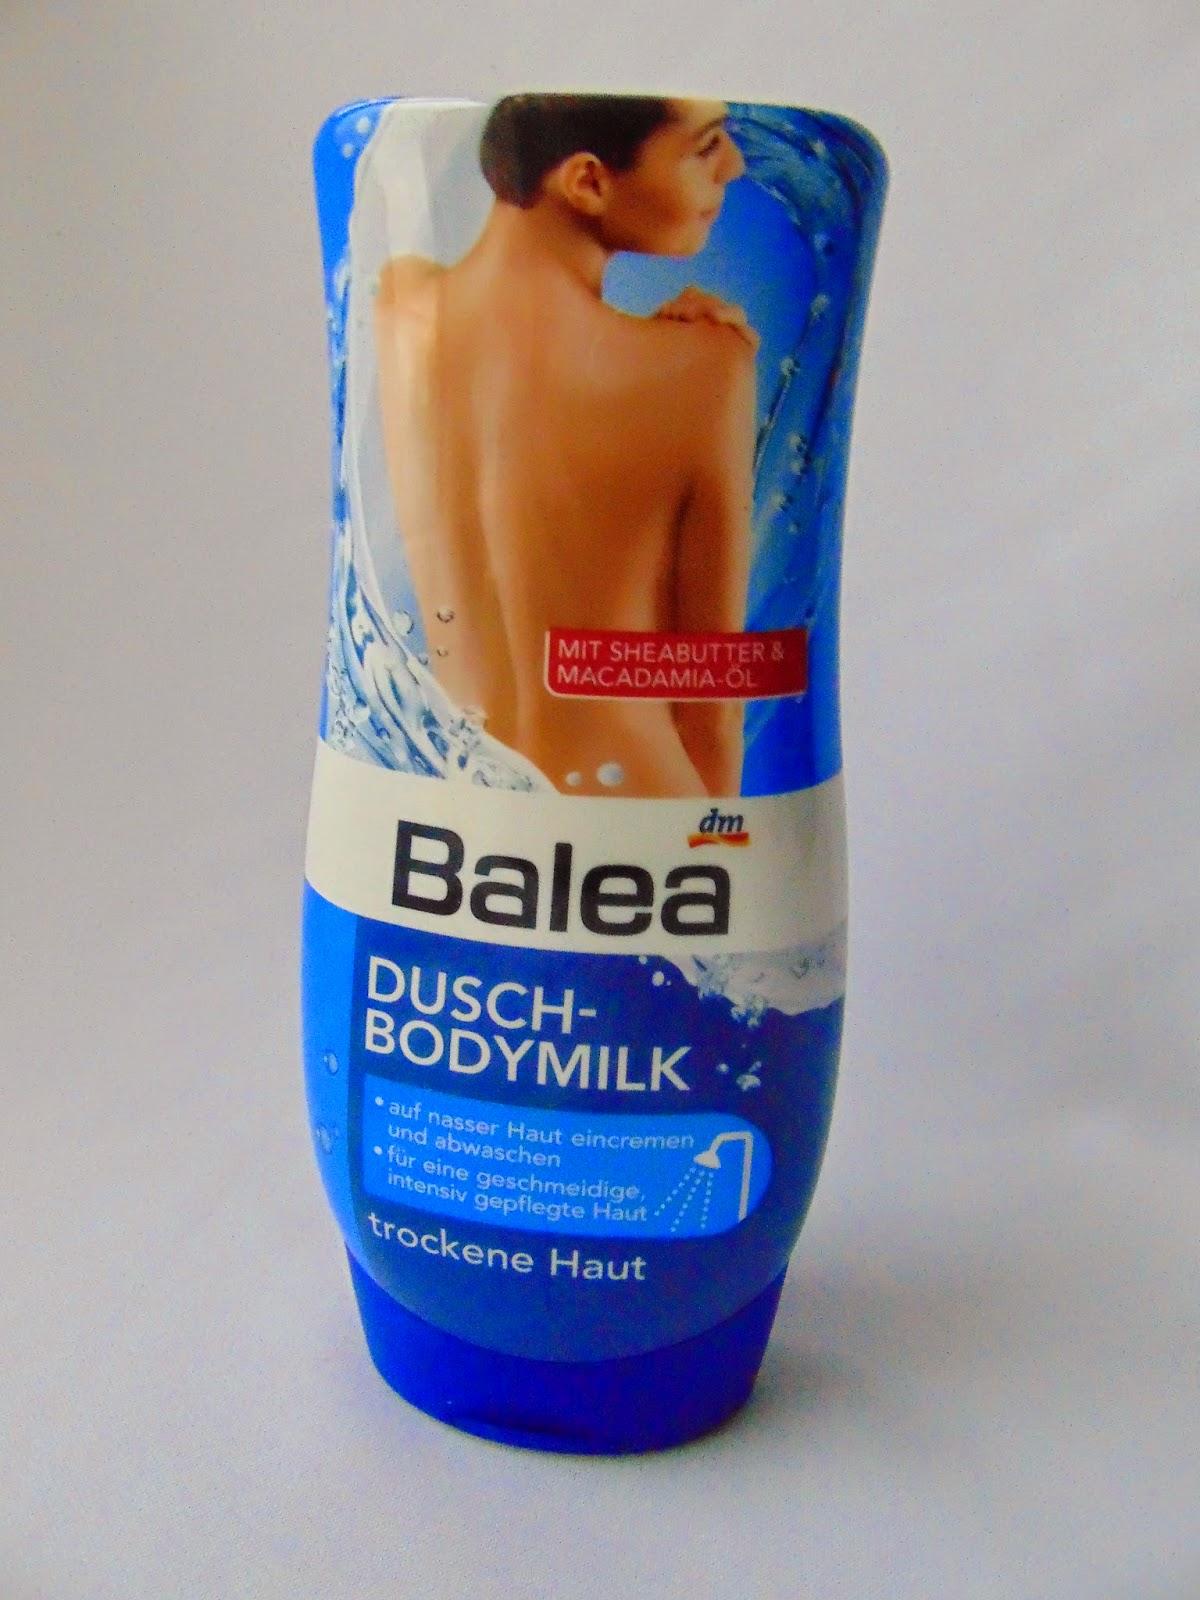 Balea Dusch-Bodymilk - www.annitschkasblog.de